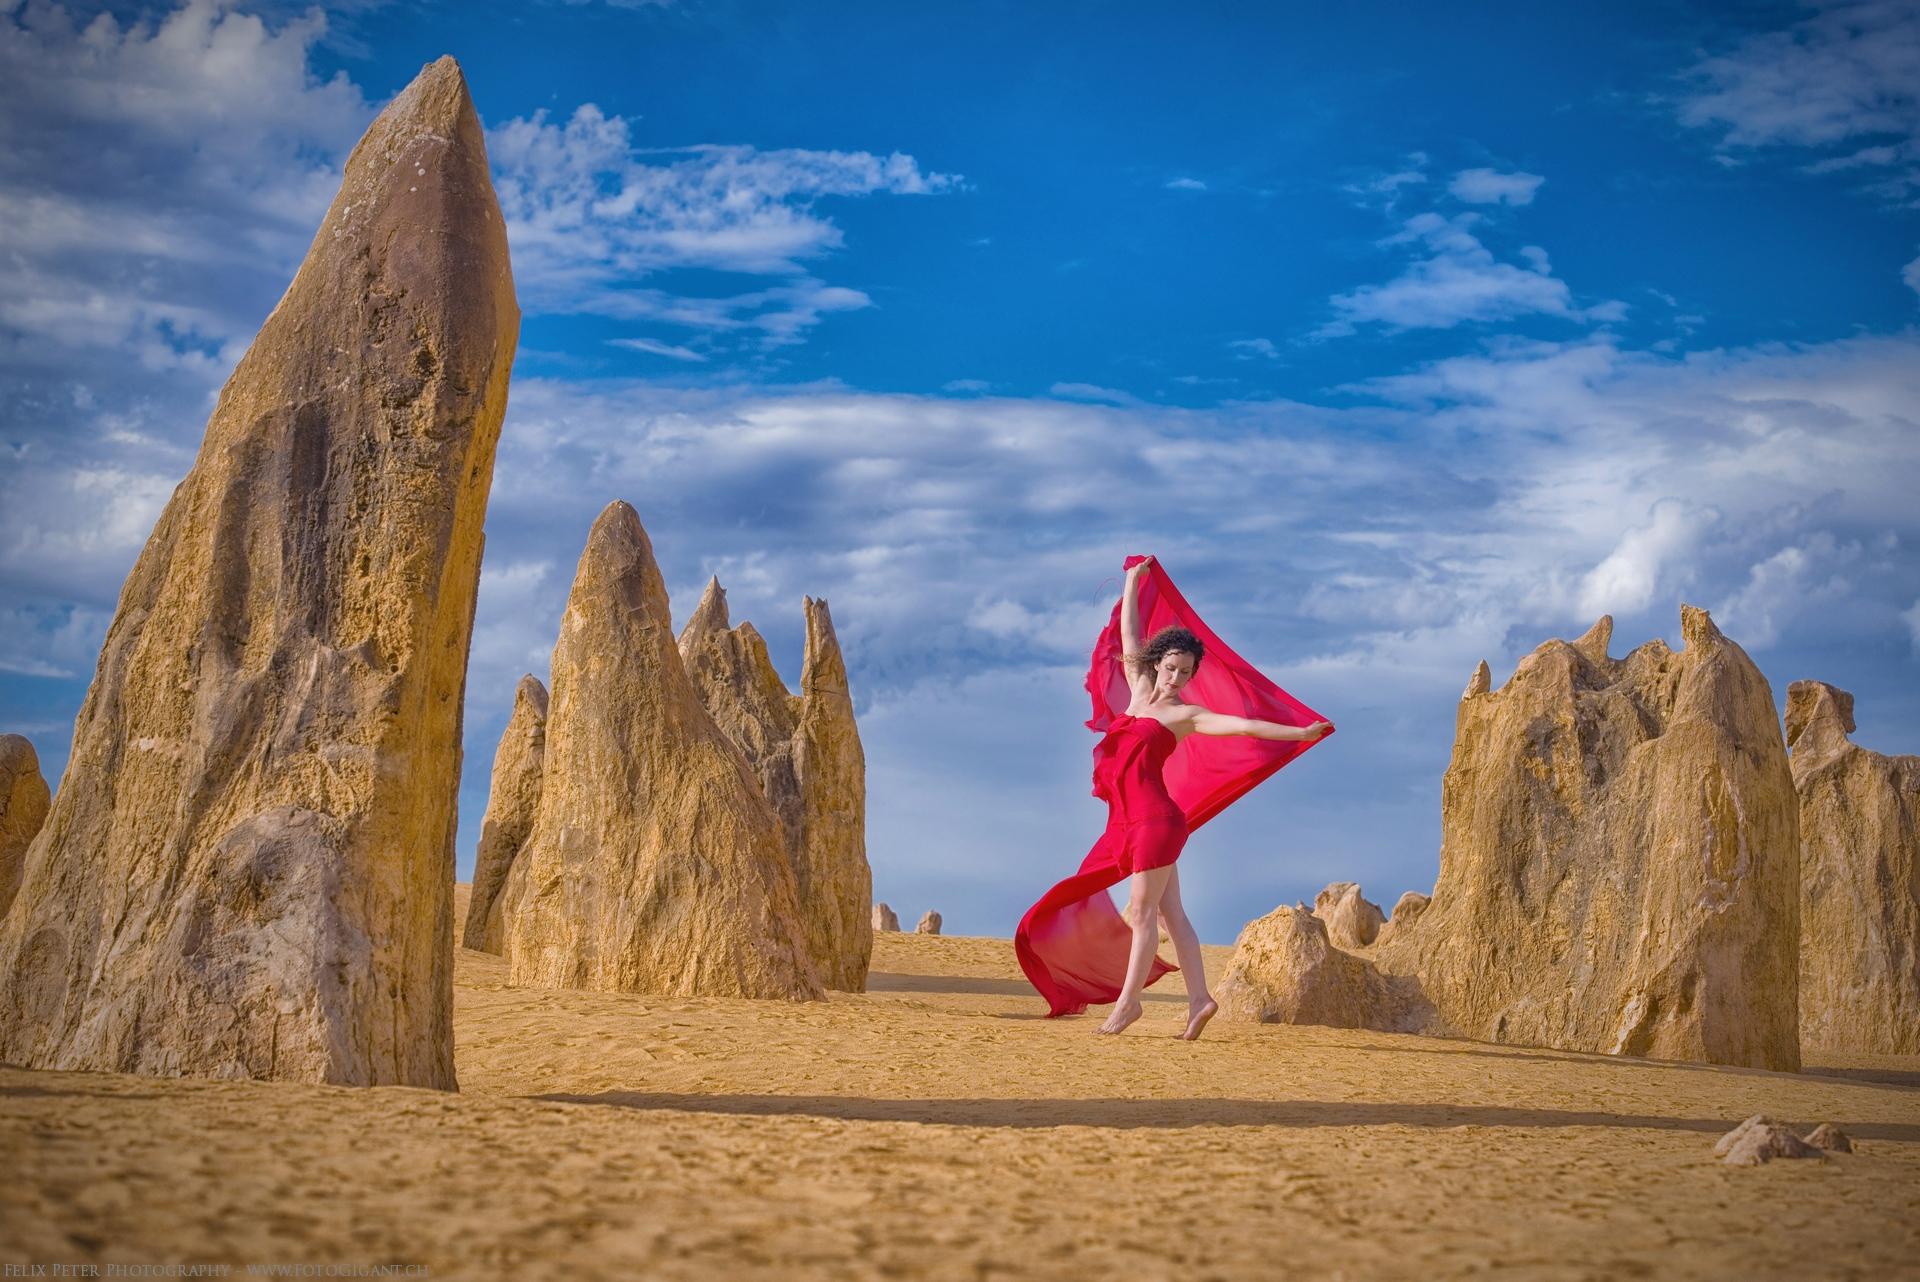 Felix-Peter-Yoga-Pilates-Dance-Fotografie_Bern_110.jpg